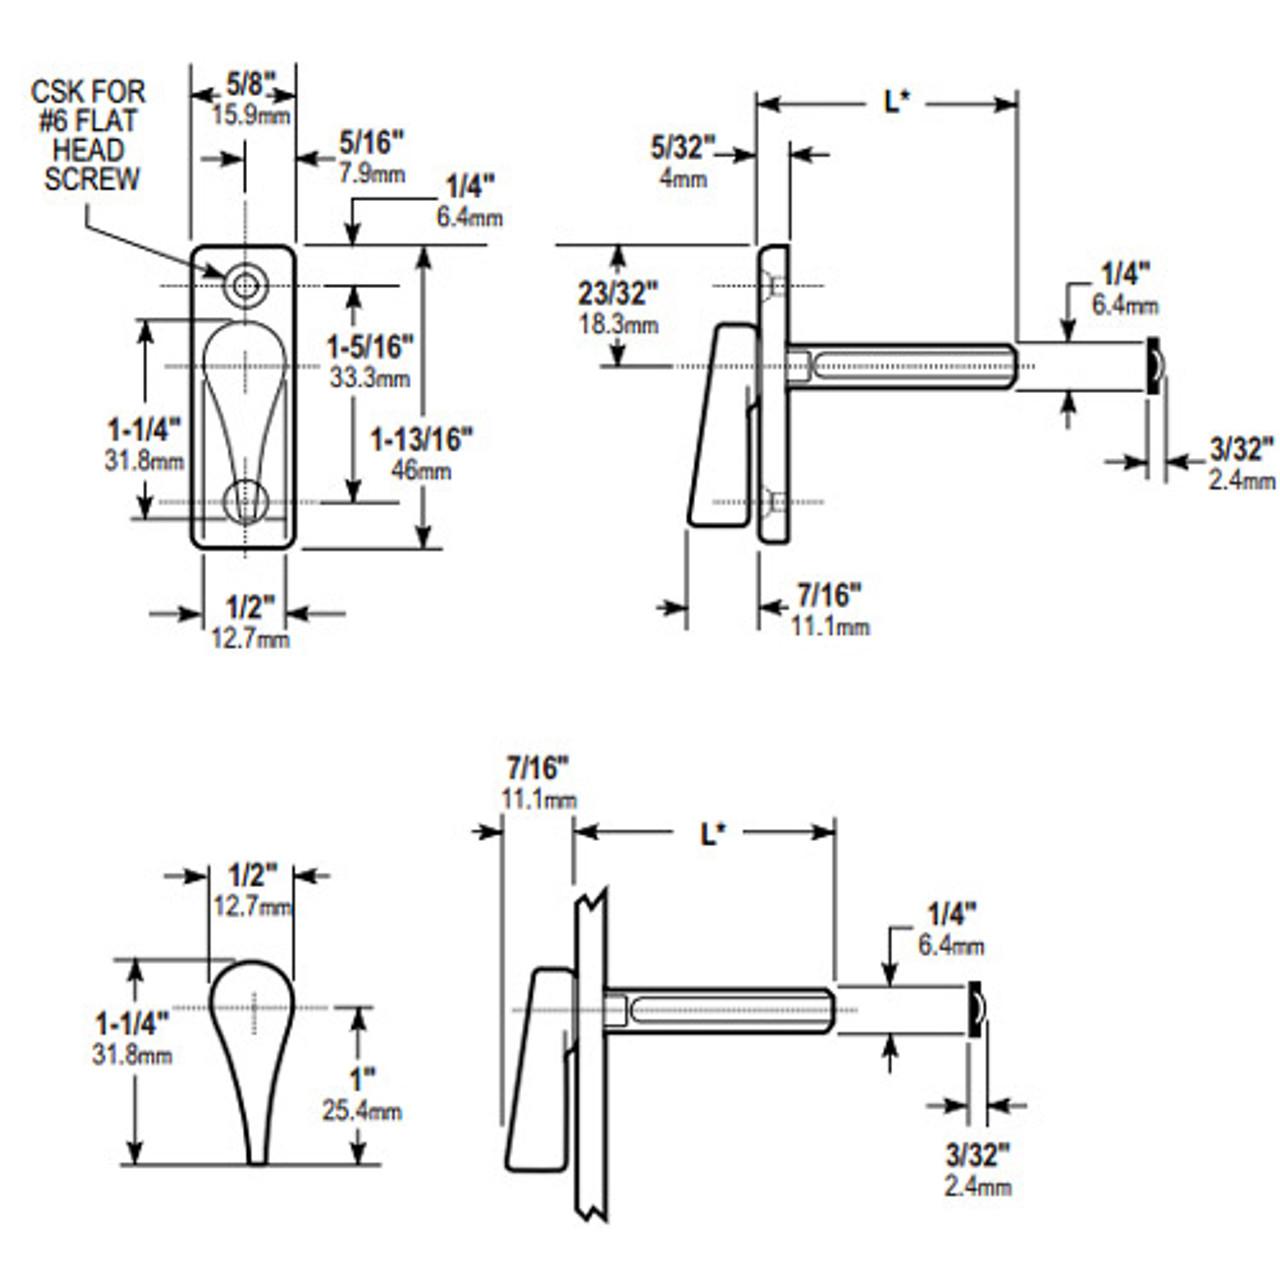 1000-21-27-119 Adams Rite 1000 Series Turns Dimensional View